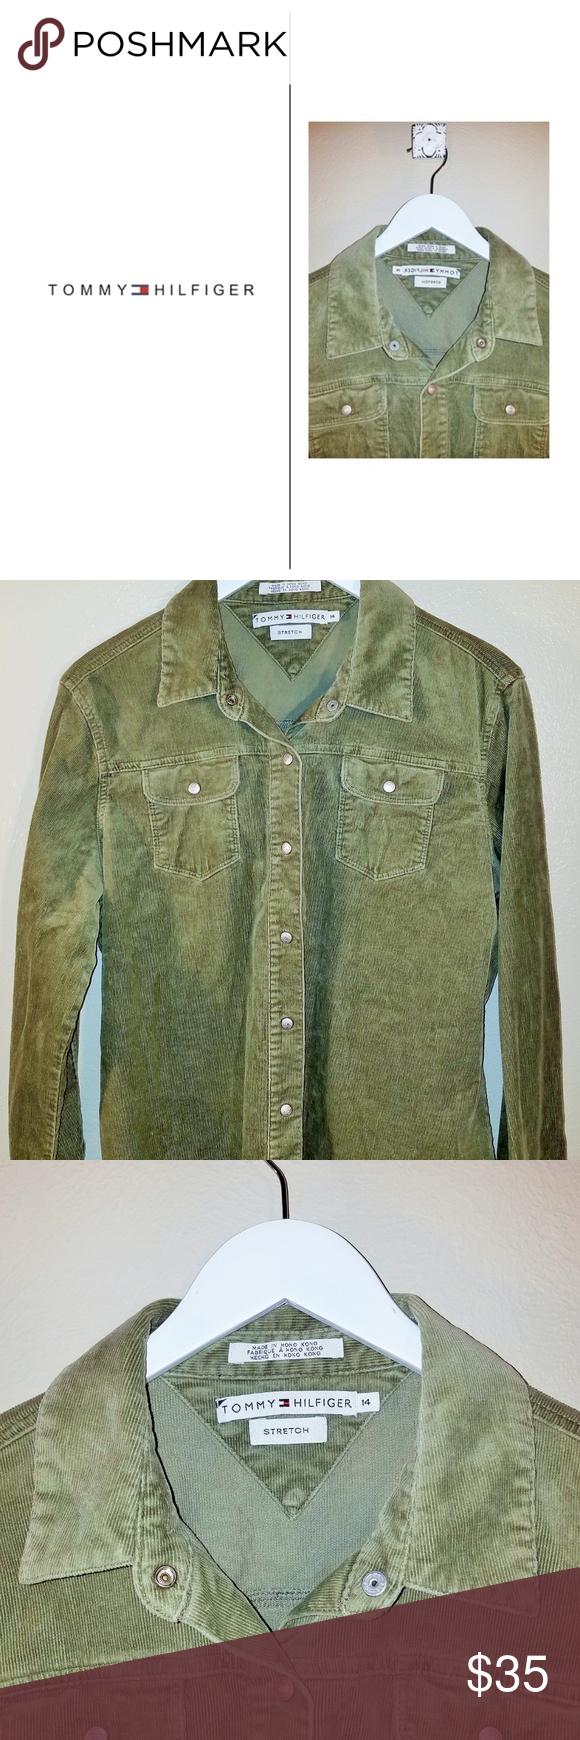 Green Corduroy TH Snap Top Size 14 Clothes design